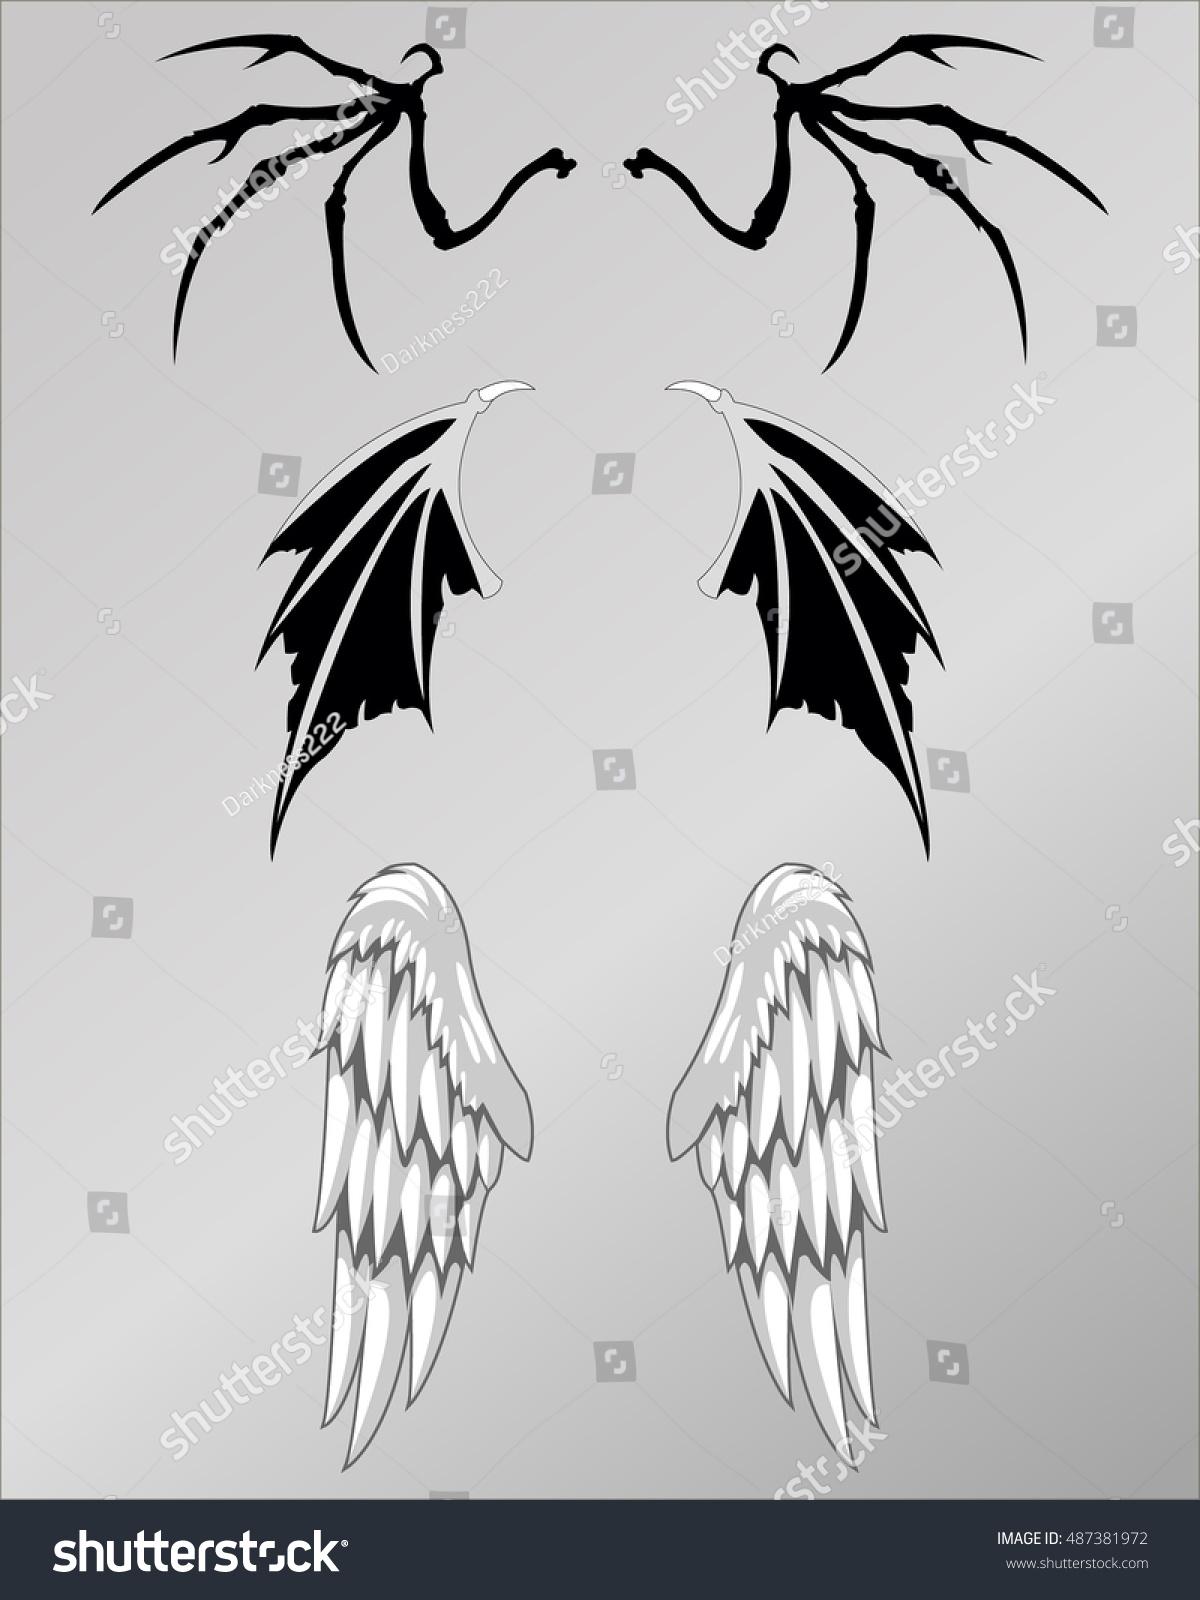 Demonic Wings Tattoo : demonic, wings, tattoo, Demon, Angel, Skull, Wings, Tattoo, Stock, Vector, (Royalty, Free), 487381972